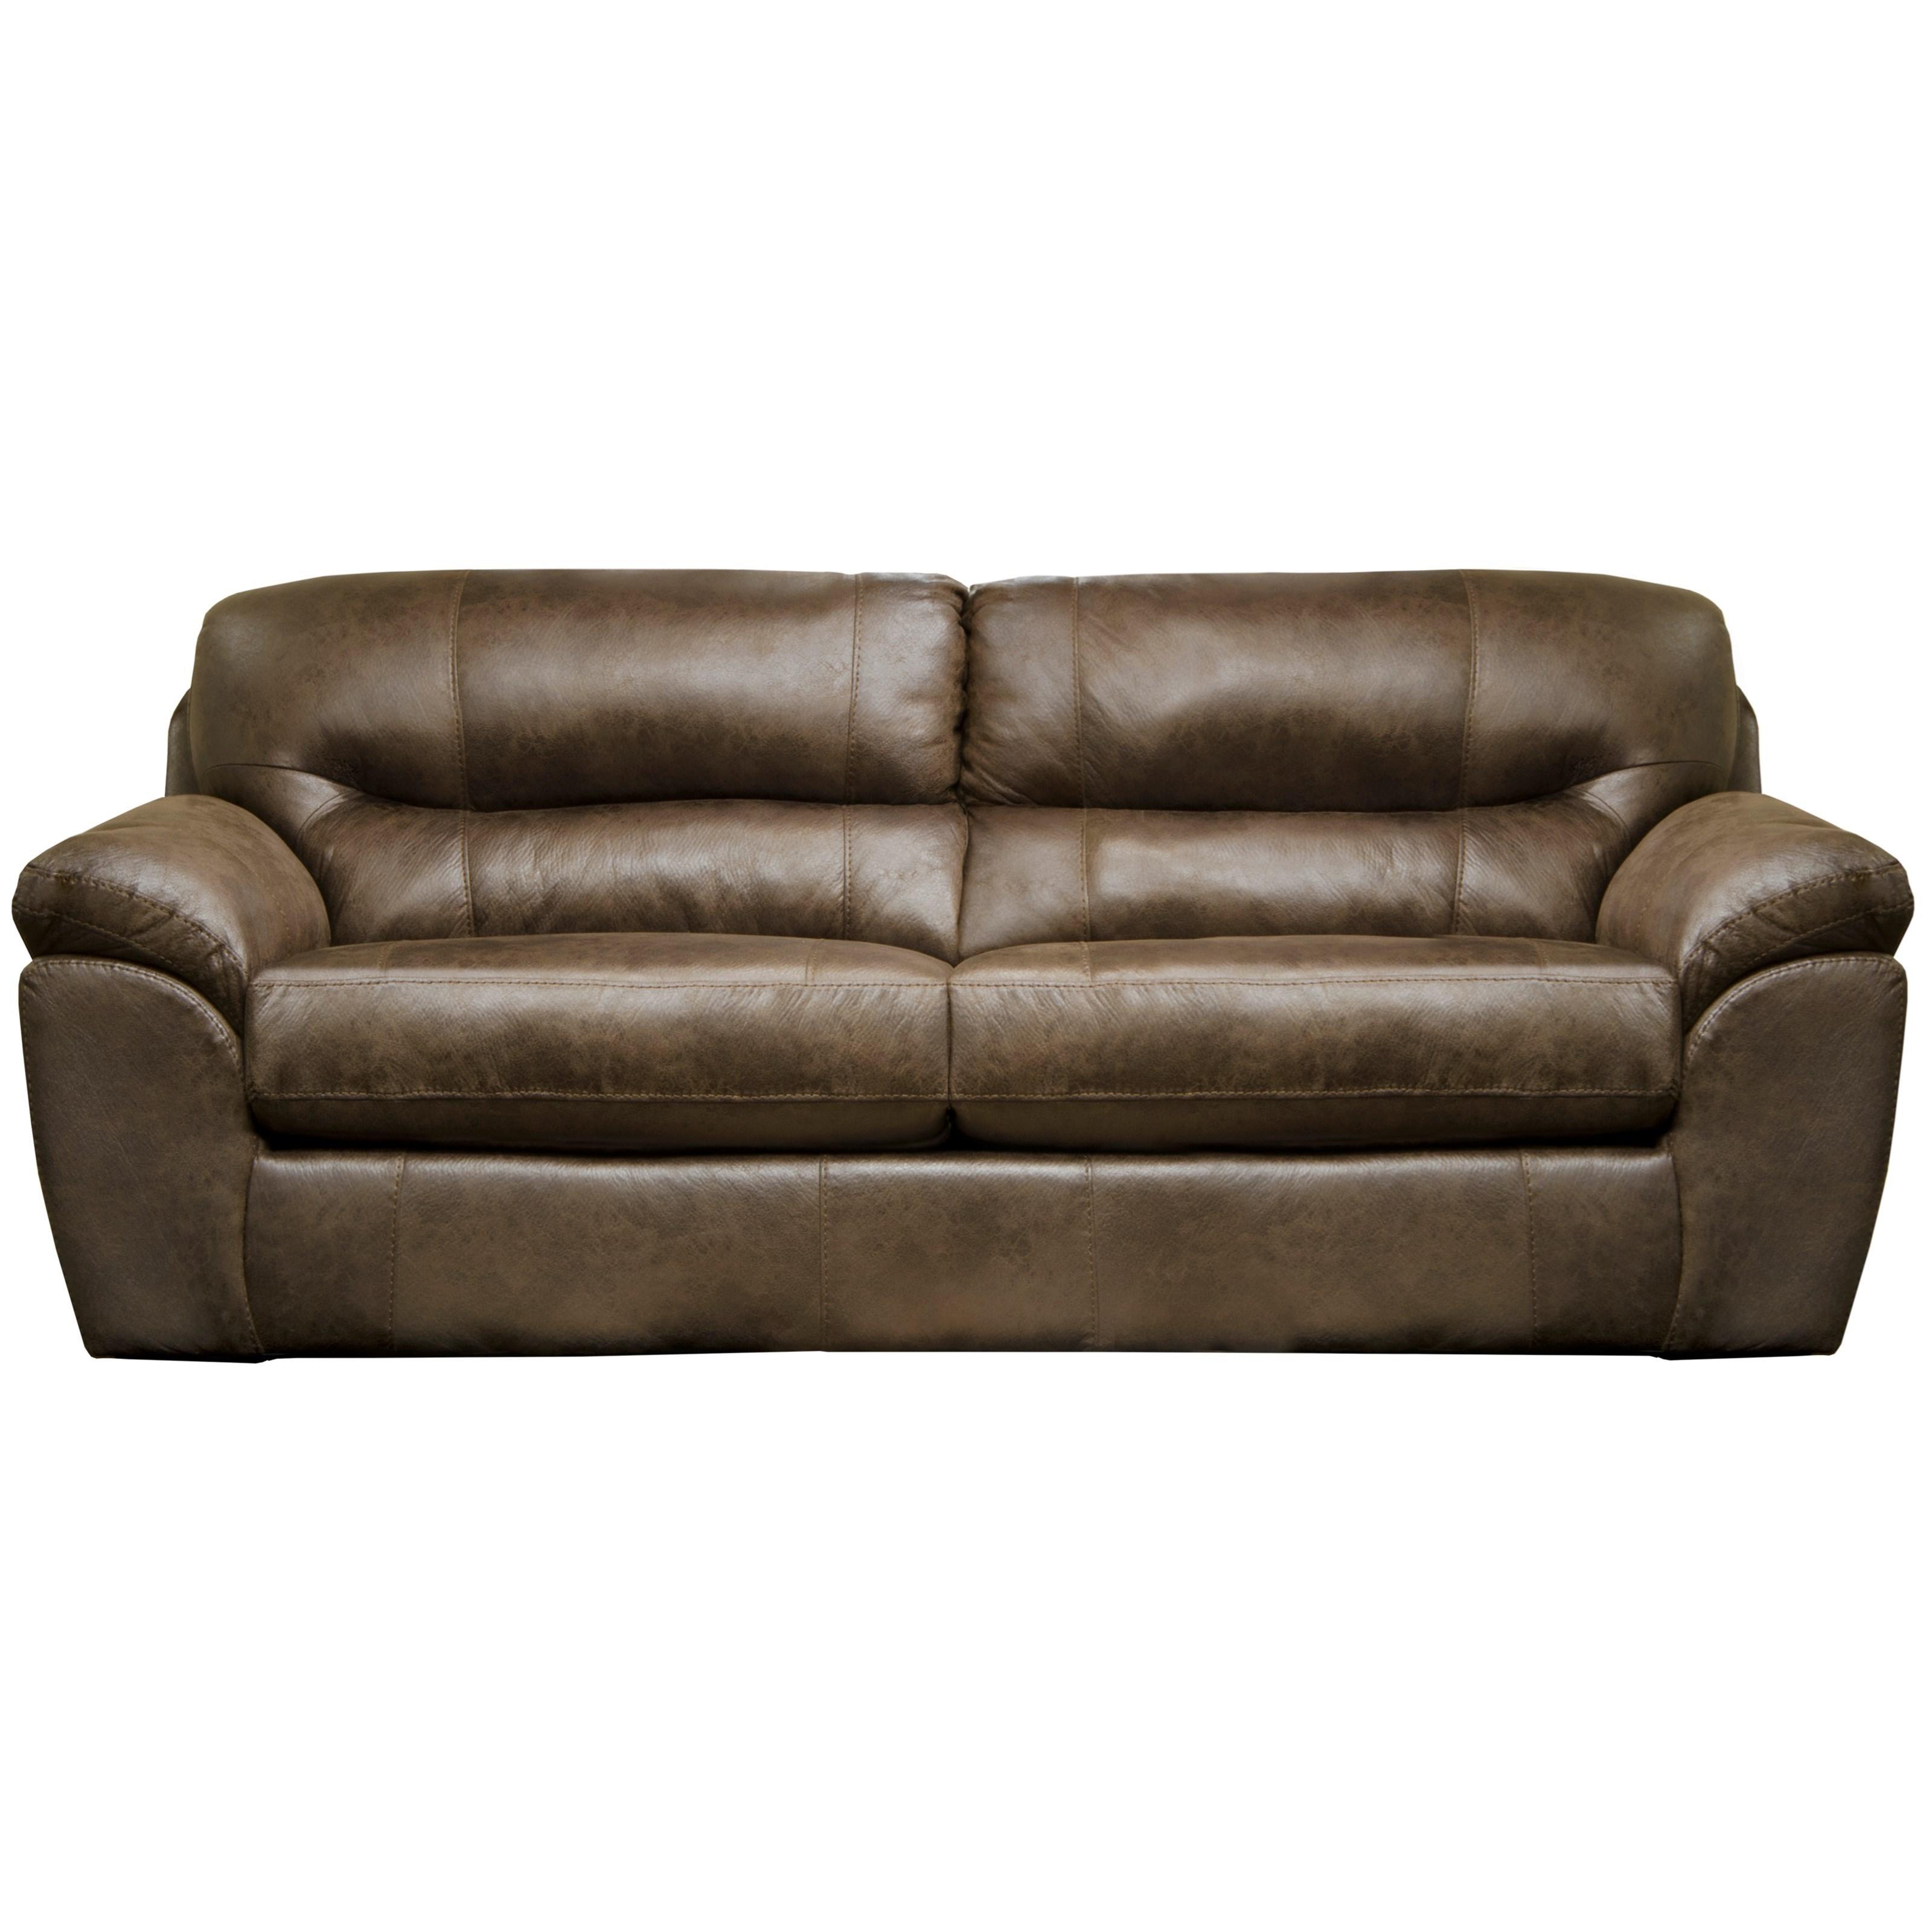 Sofa with Pillow Arms